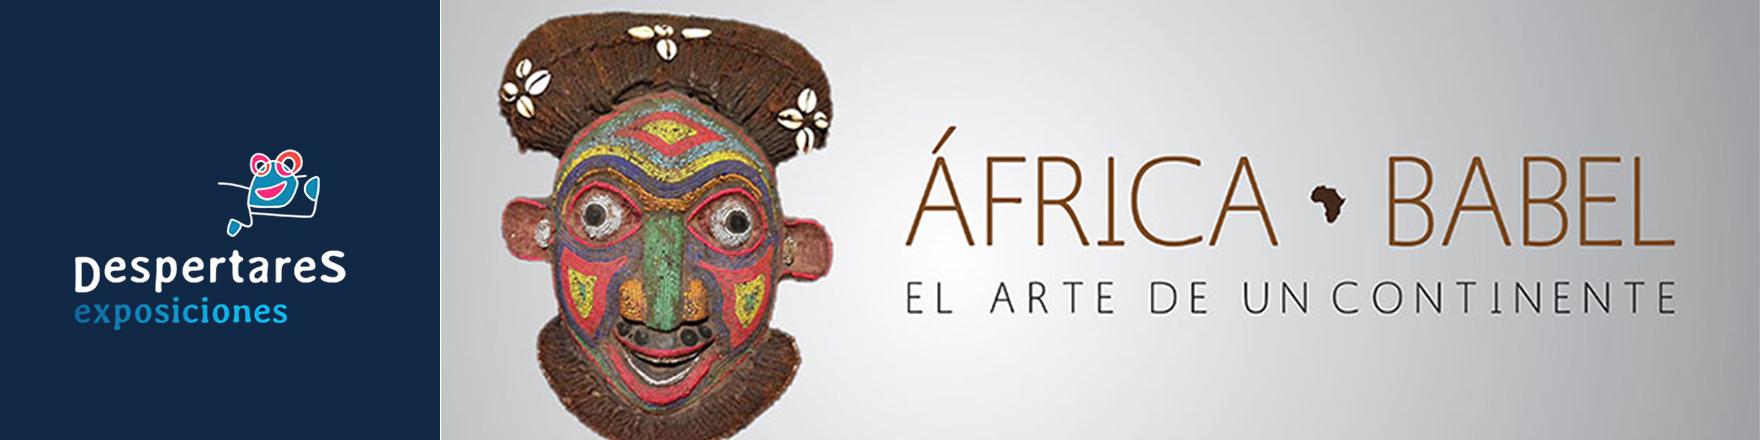 África - Babel